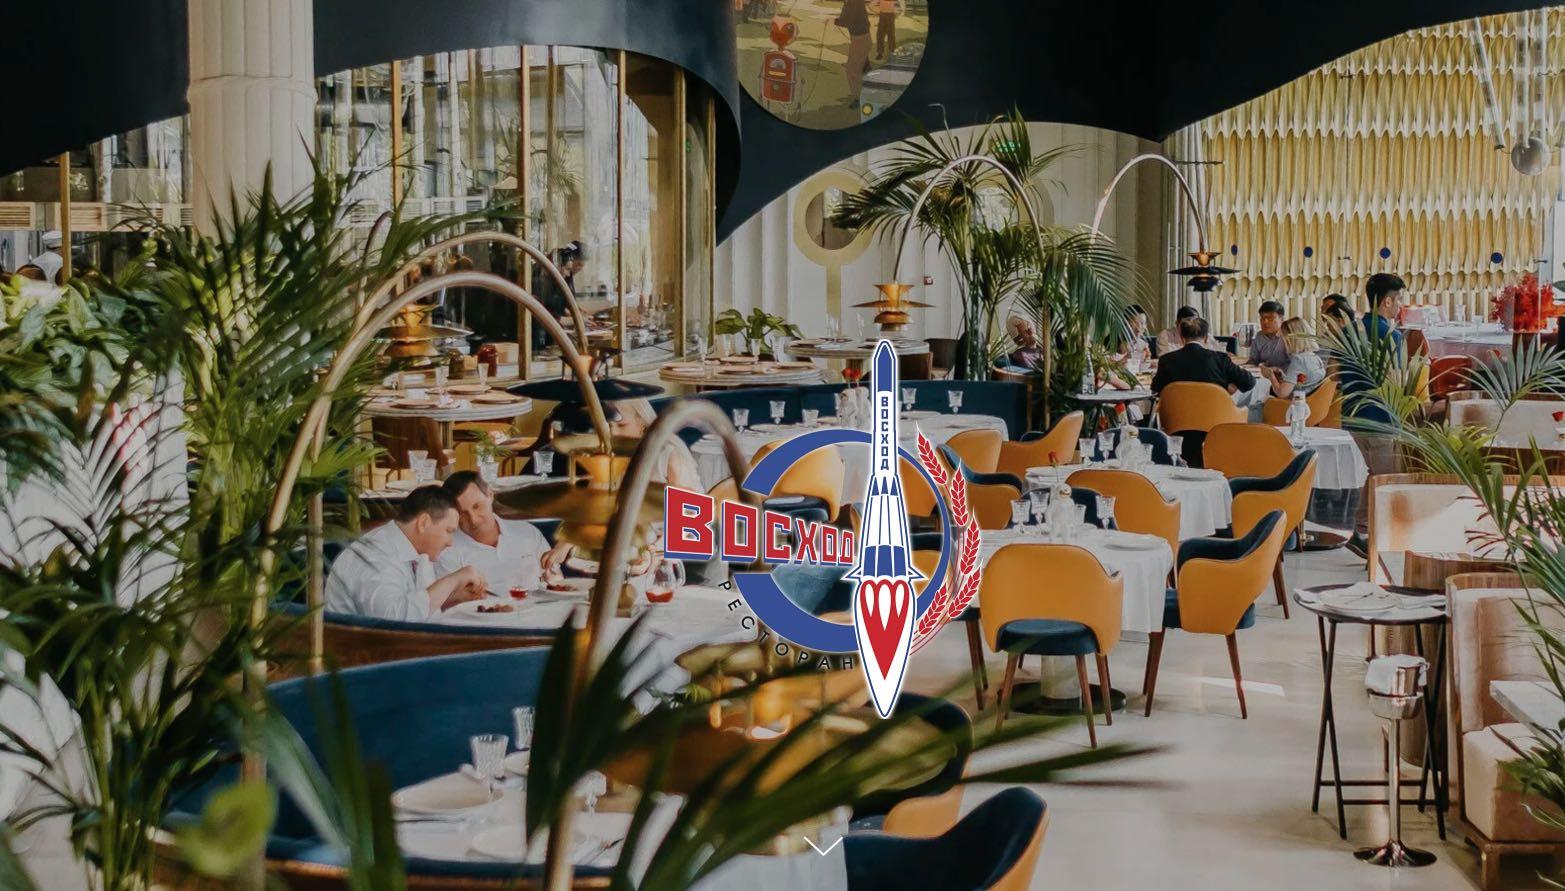 Voskhod Restaurant - Zarjadje Park